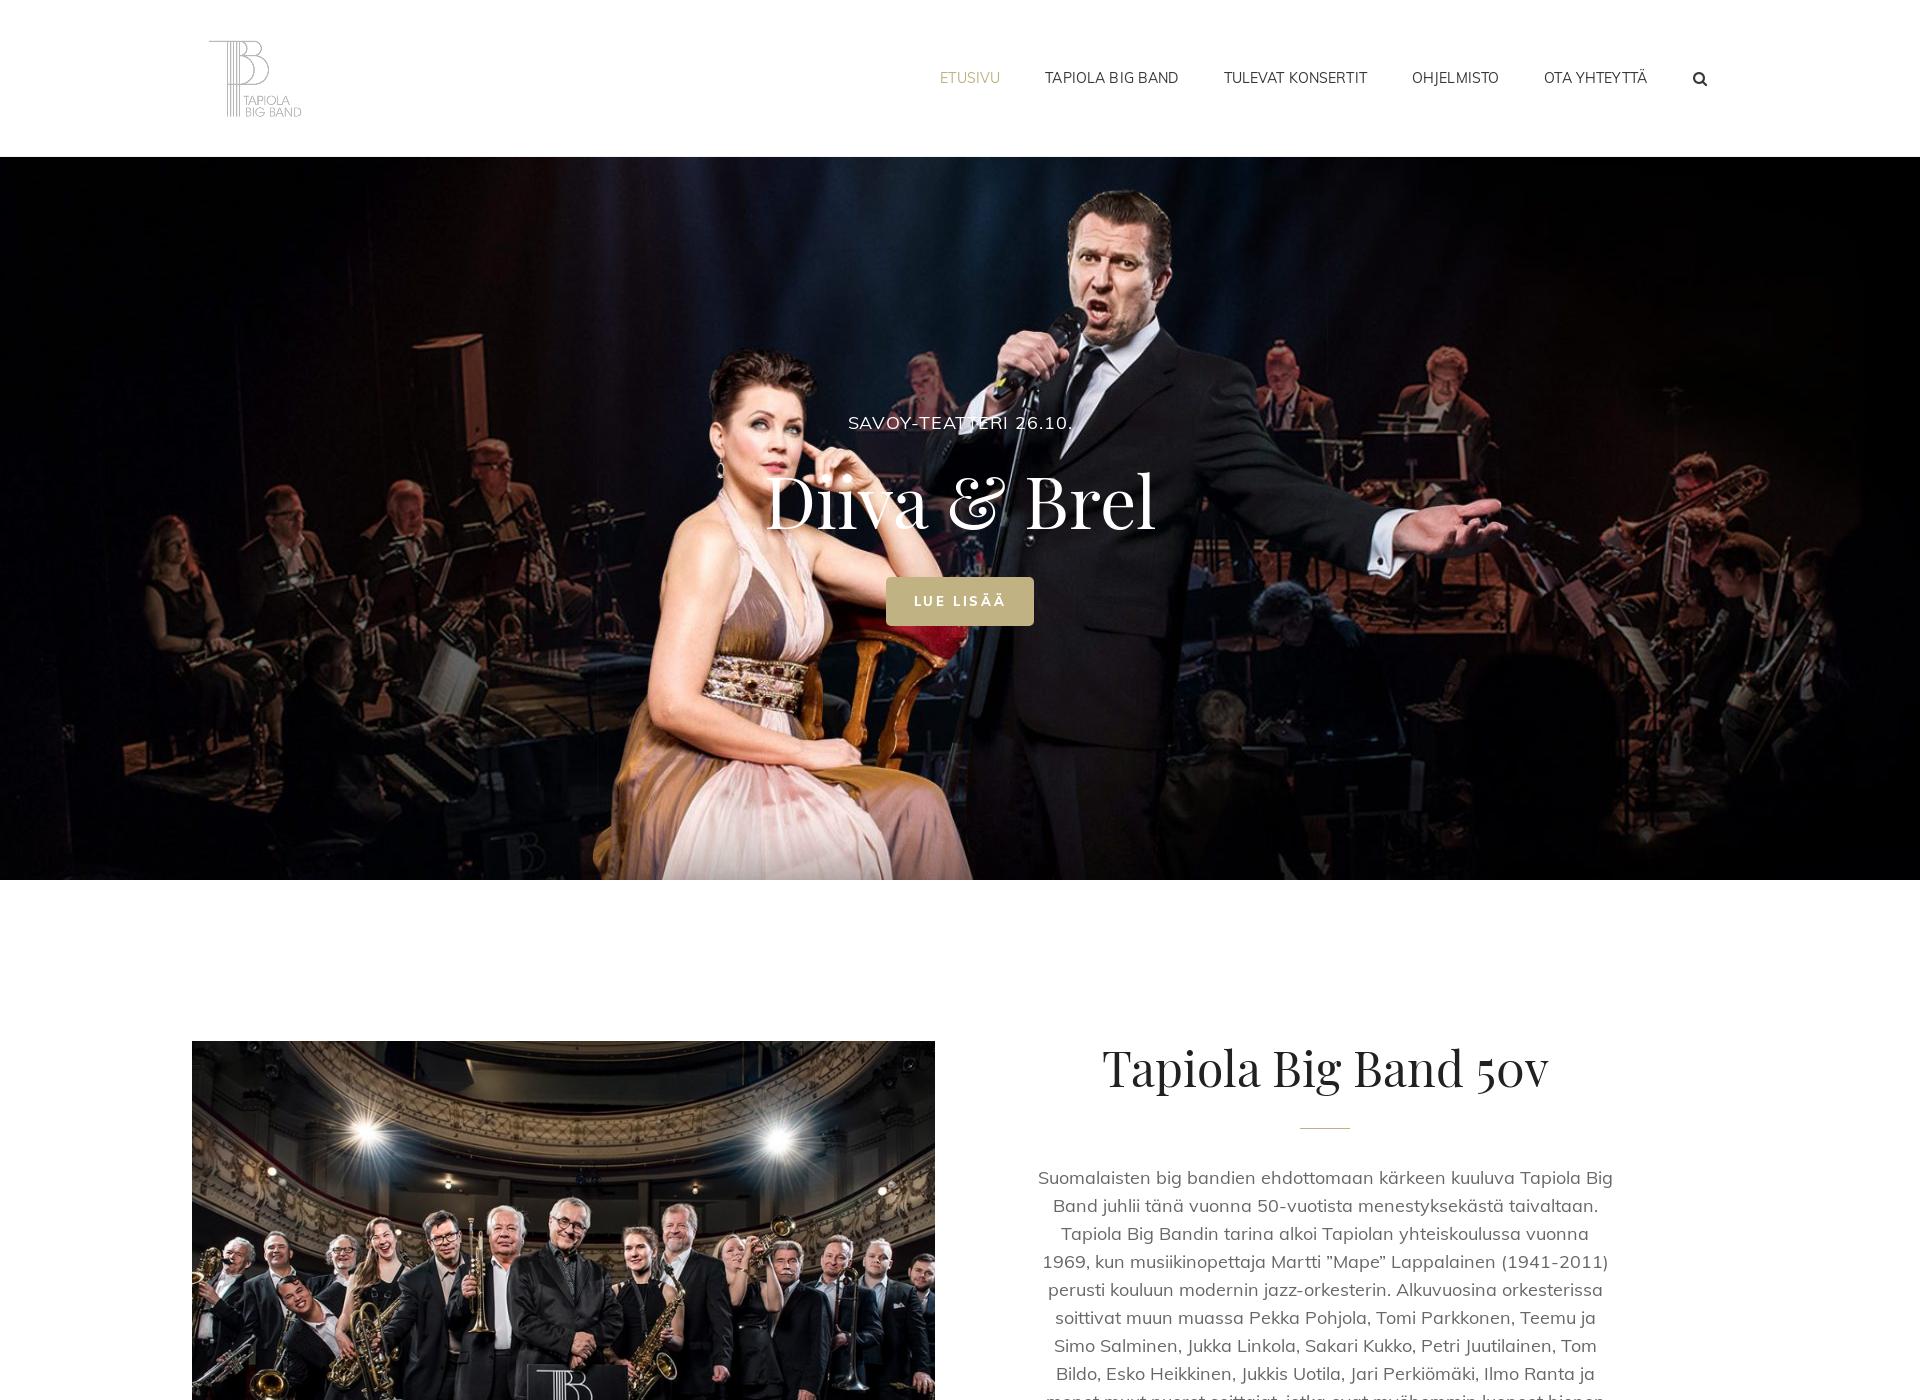 Screenshot for tapiolabigband.fi